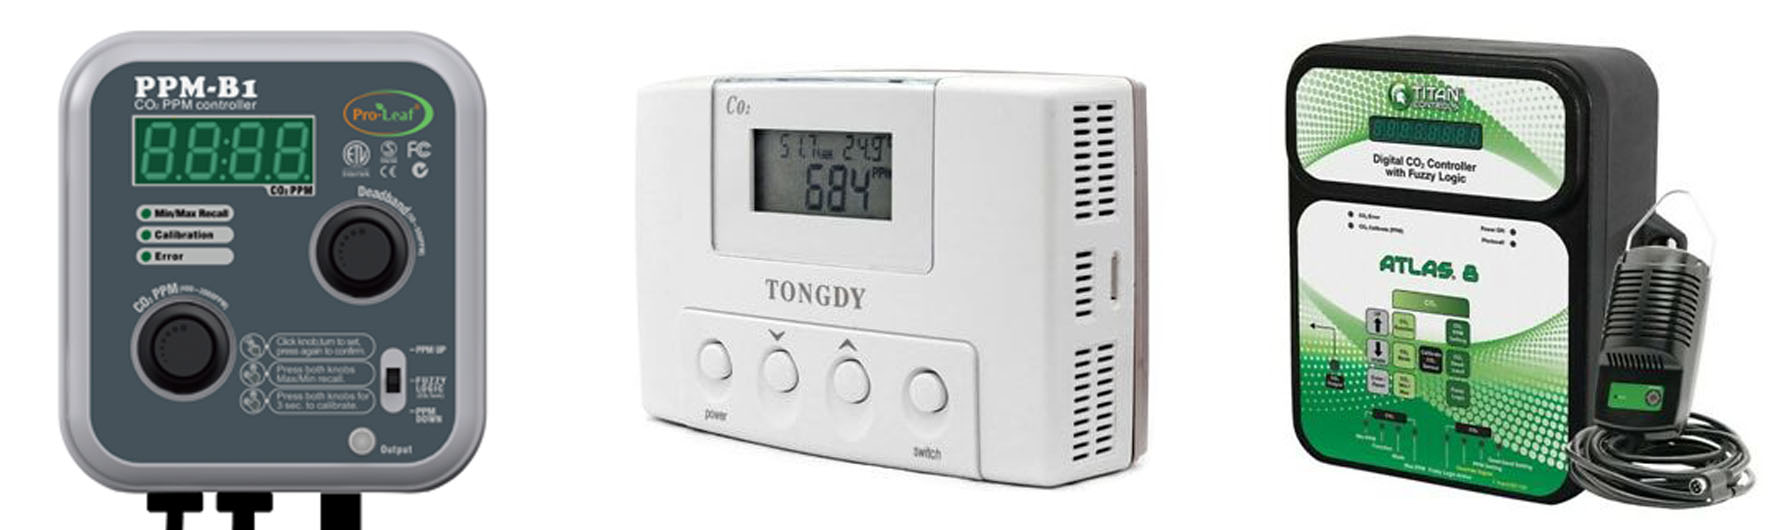 Контроллер Со2 для теплицы